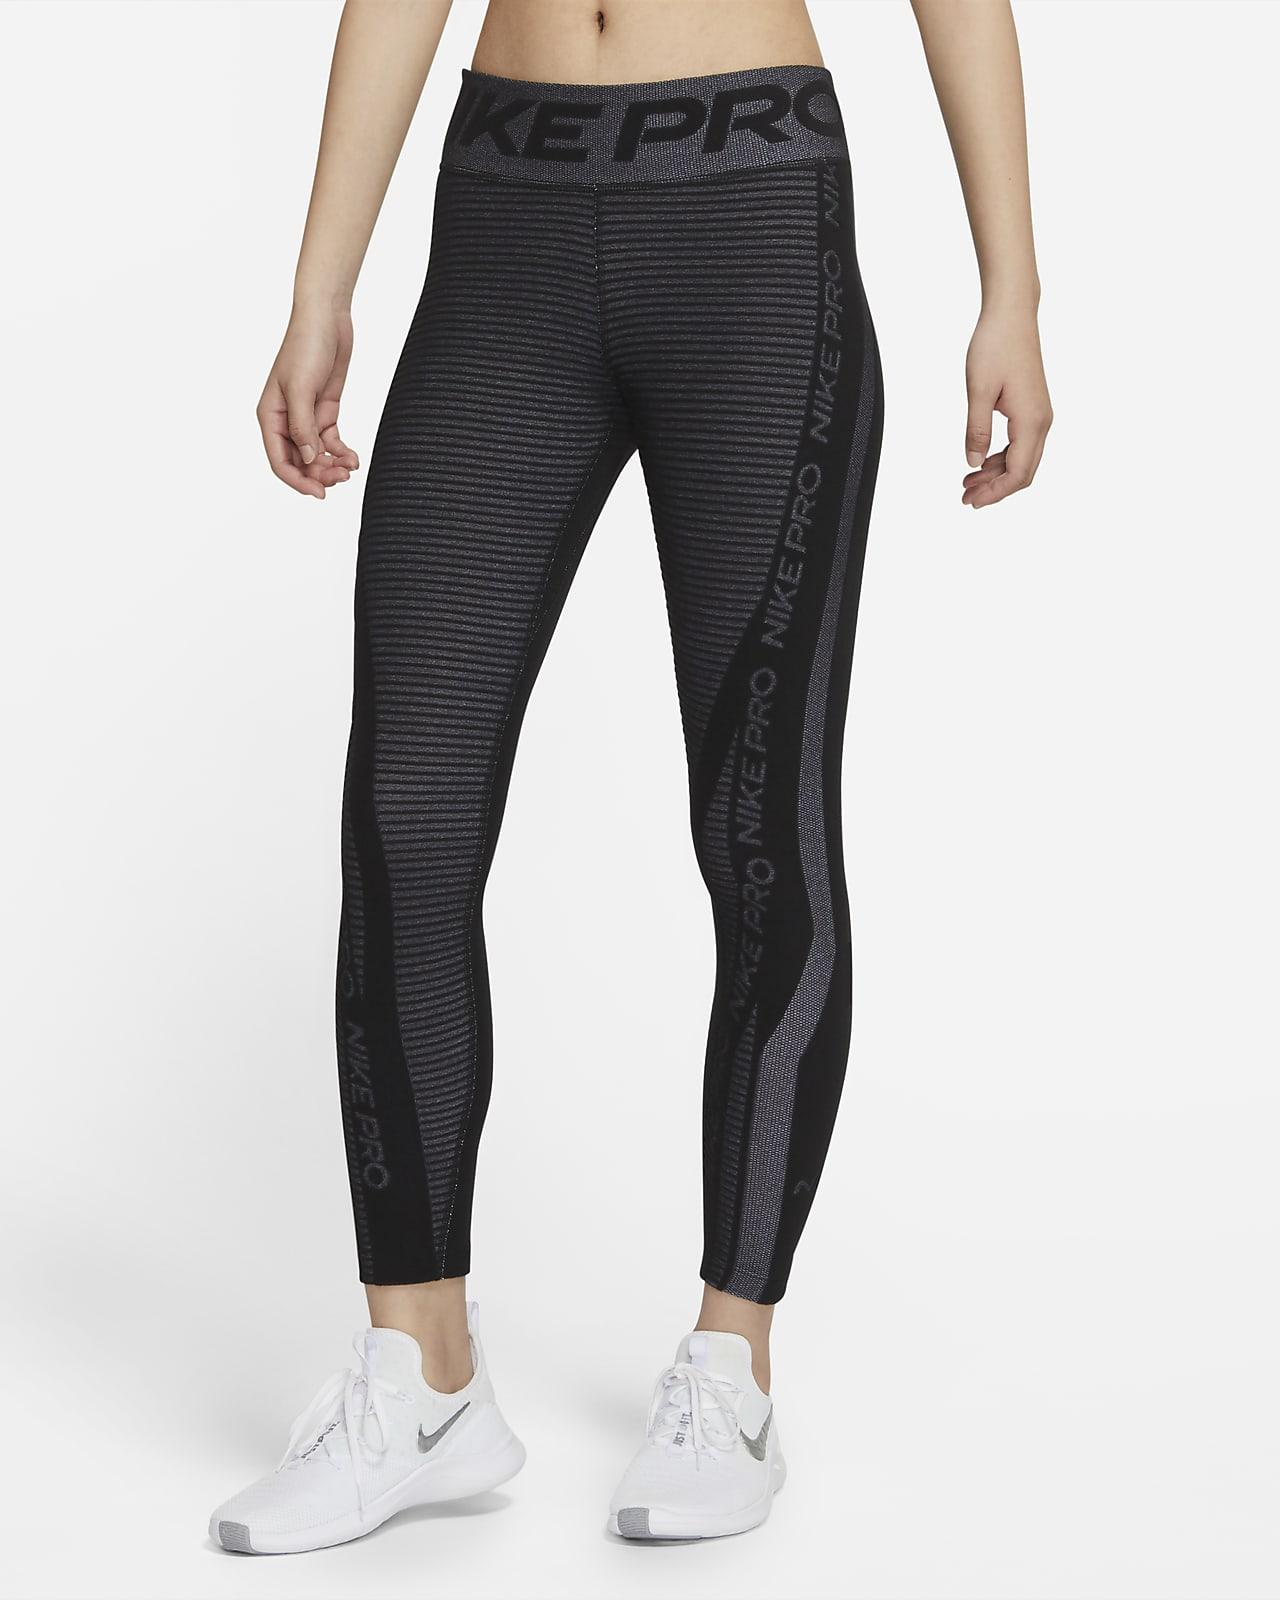 Nike Pro HyperWarm Trainings-Tights für Damen